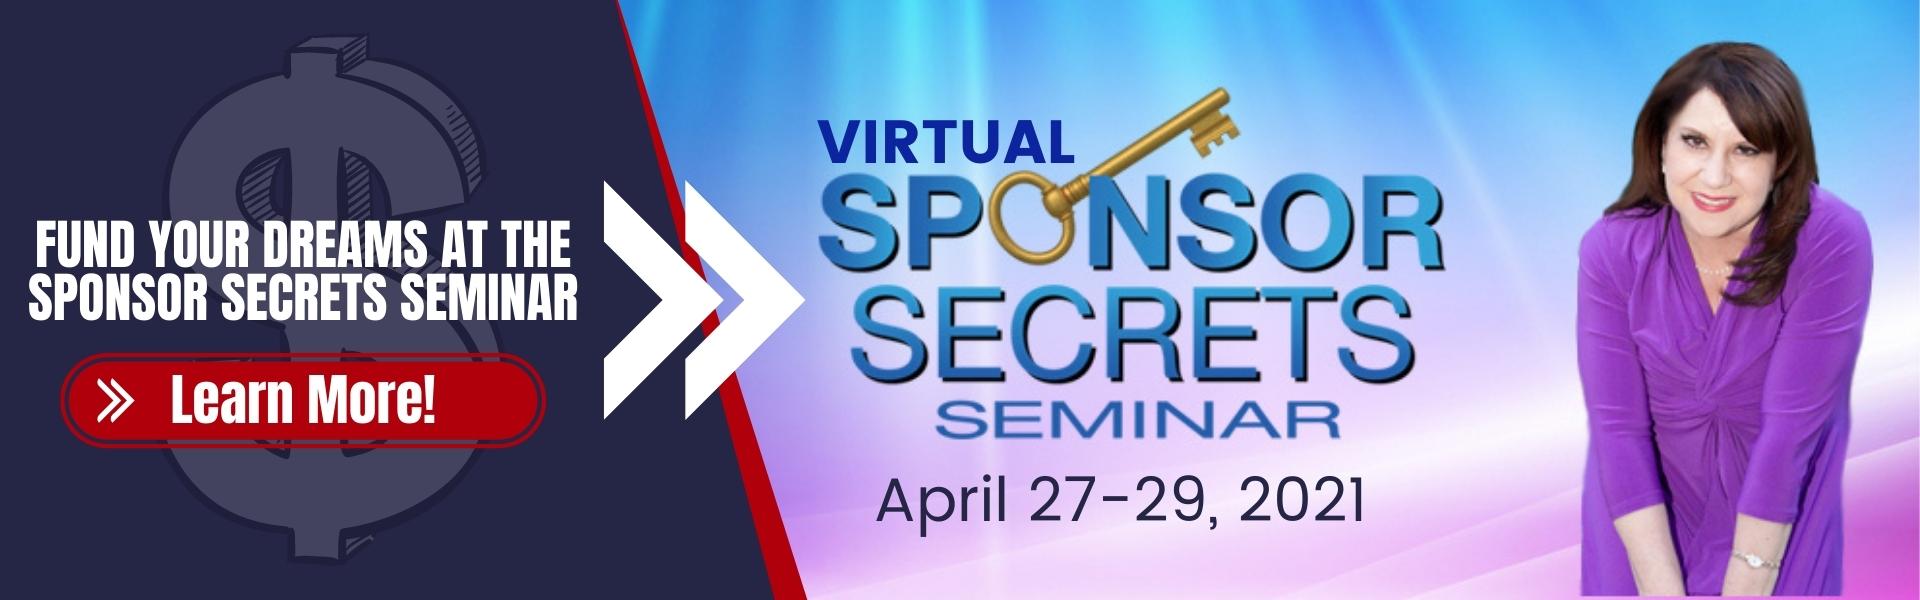 Virtual Sponsor Secrets Seminar - April 27-29, 2021